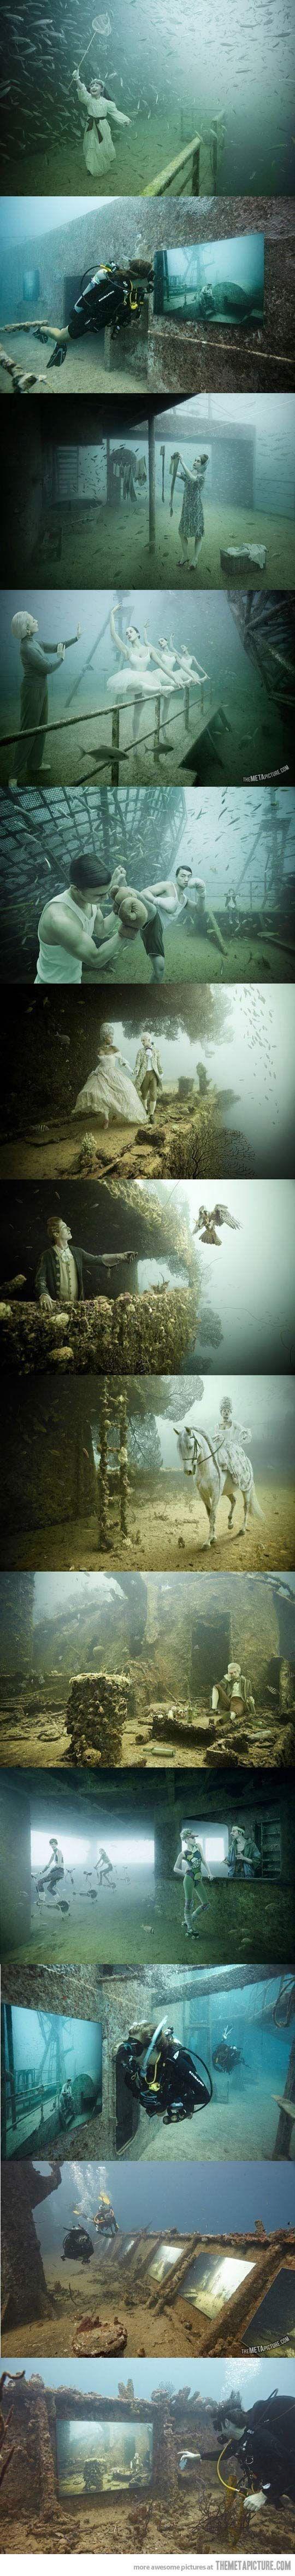 An amazing underwater museum�